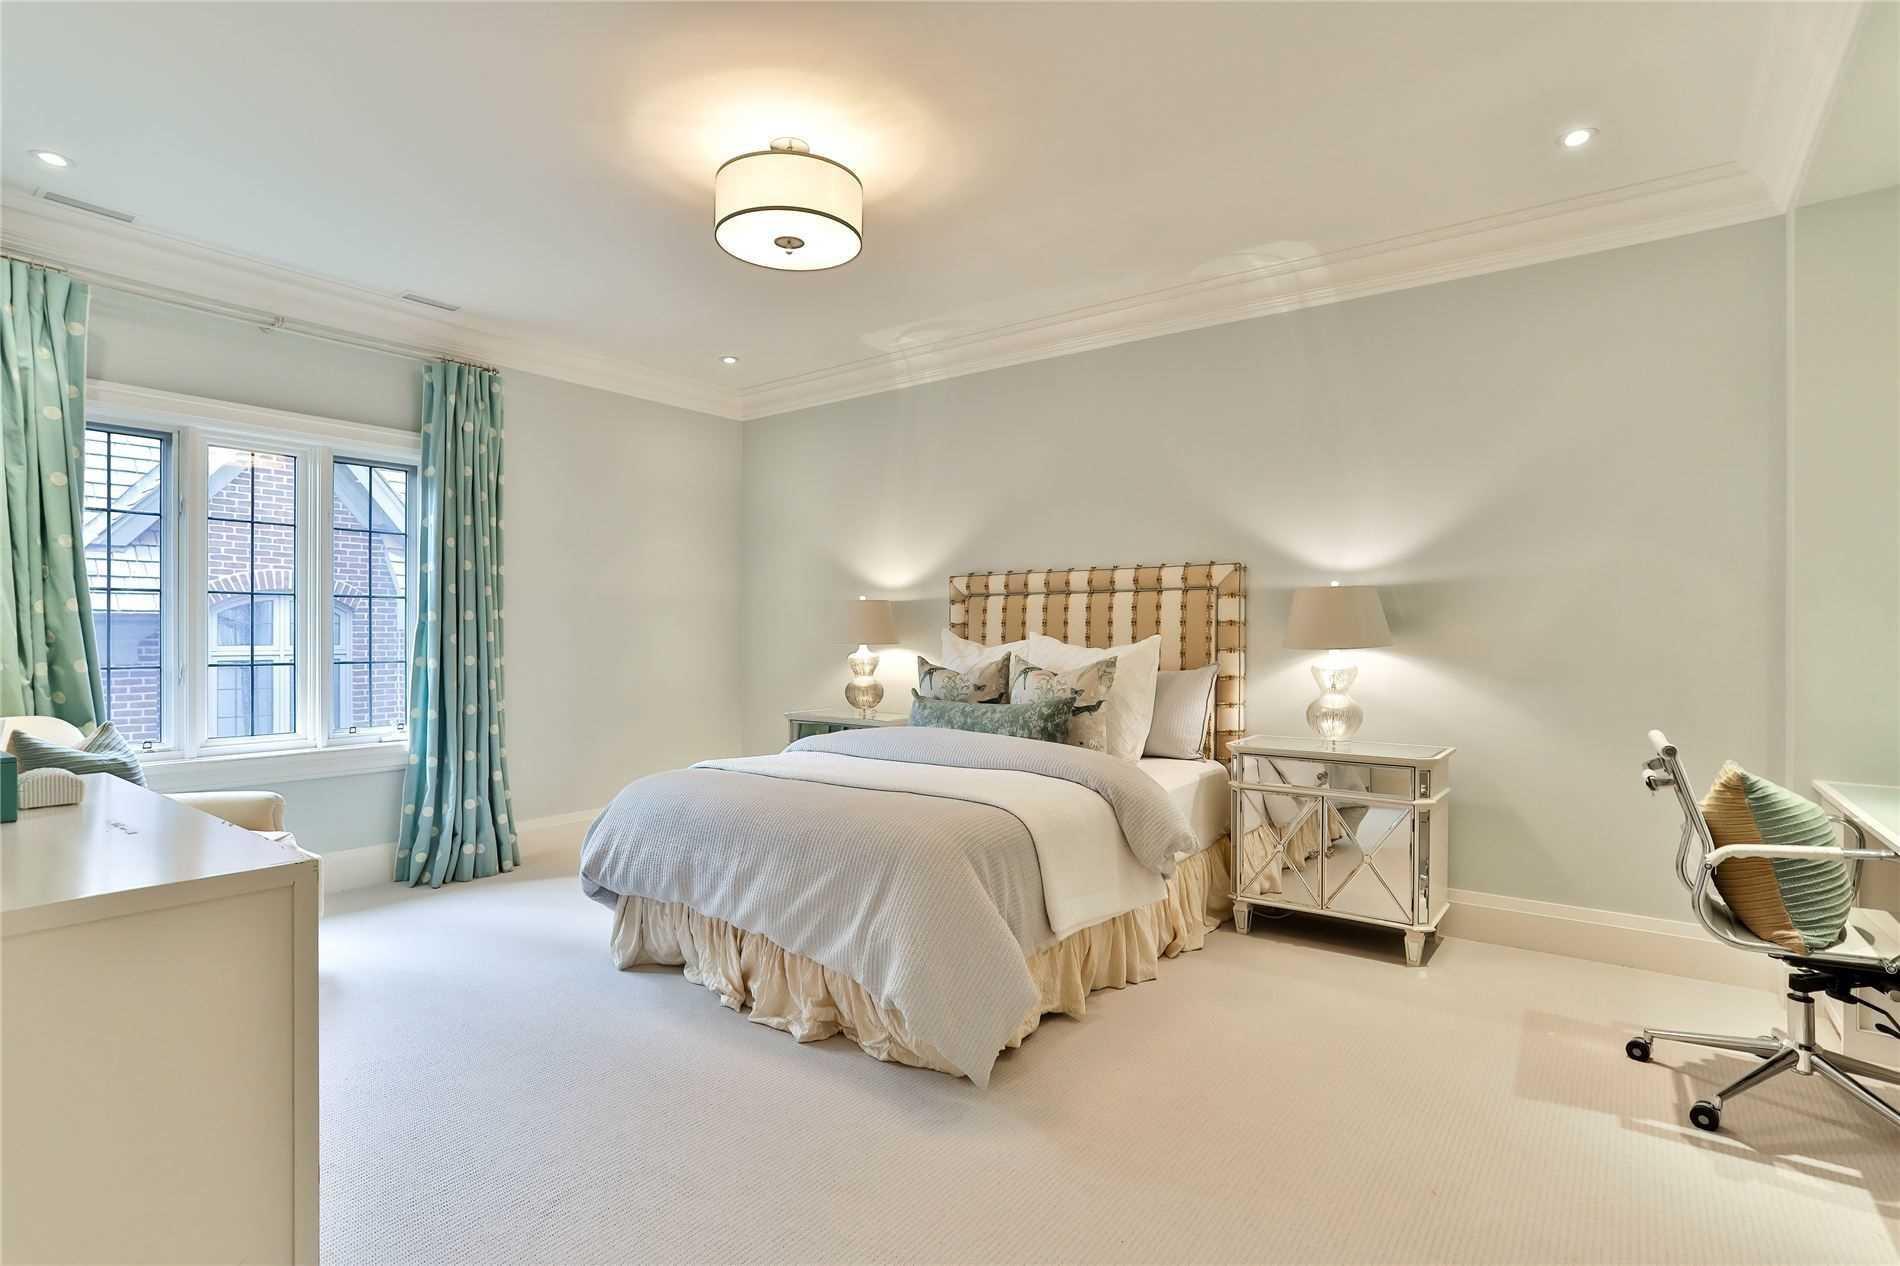 134 Riverview Dr, Toronto, Ontario M4N3C8, 5 Bedrooms Bedrooms, 15 Rooms Rooms,8 BathroomsBathrooms,Detached,For Sale,Riverview,C5361878